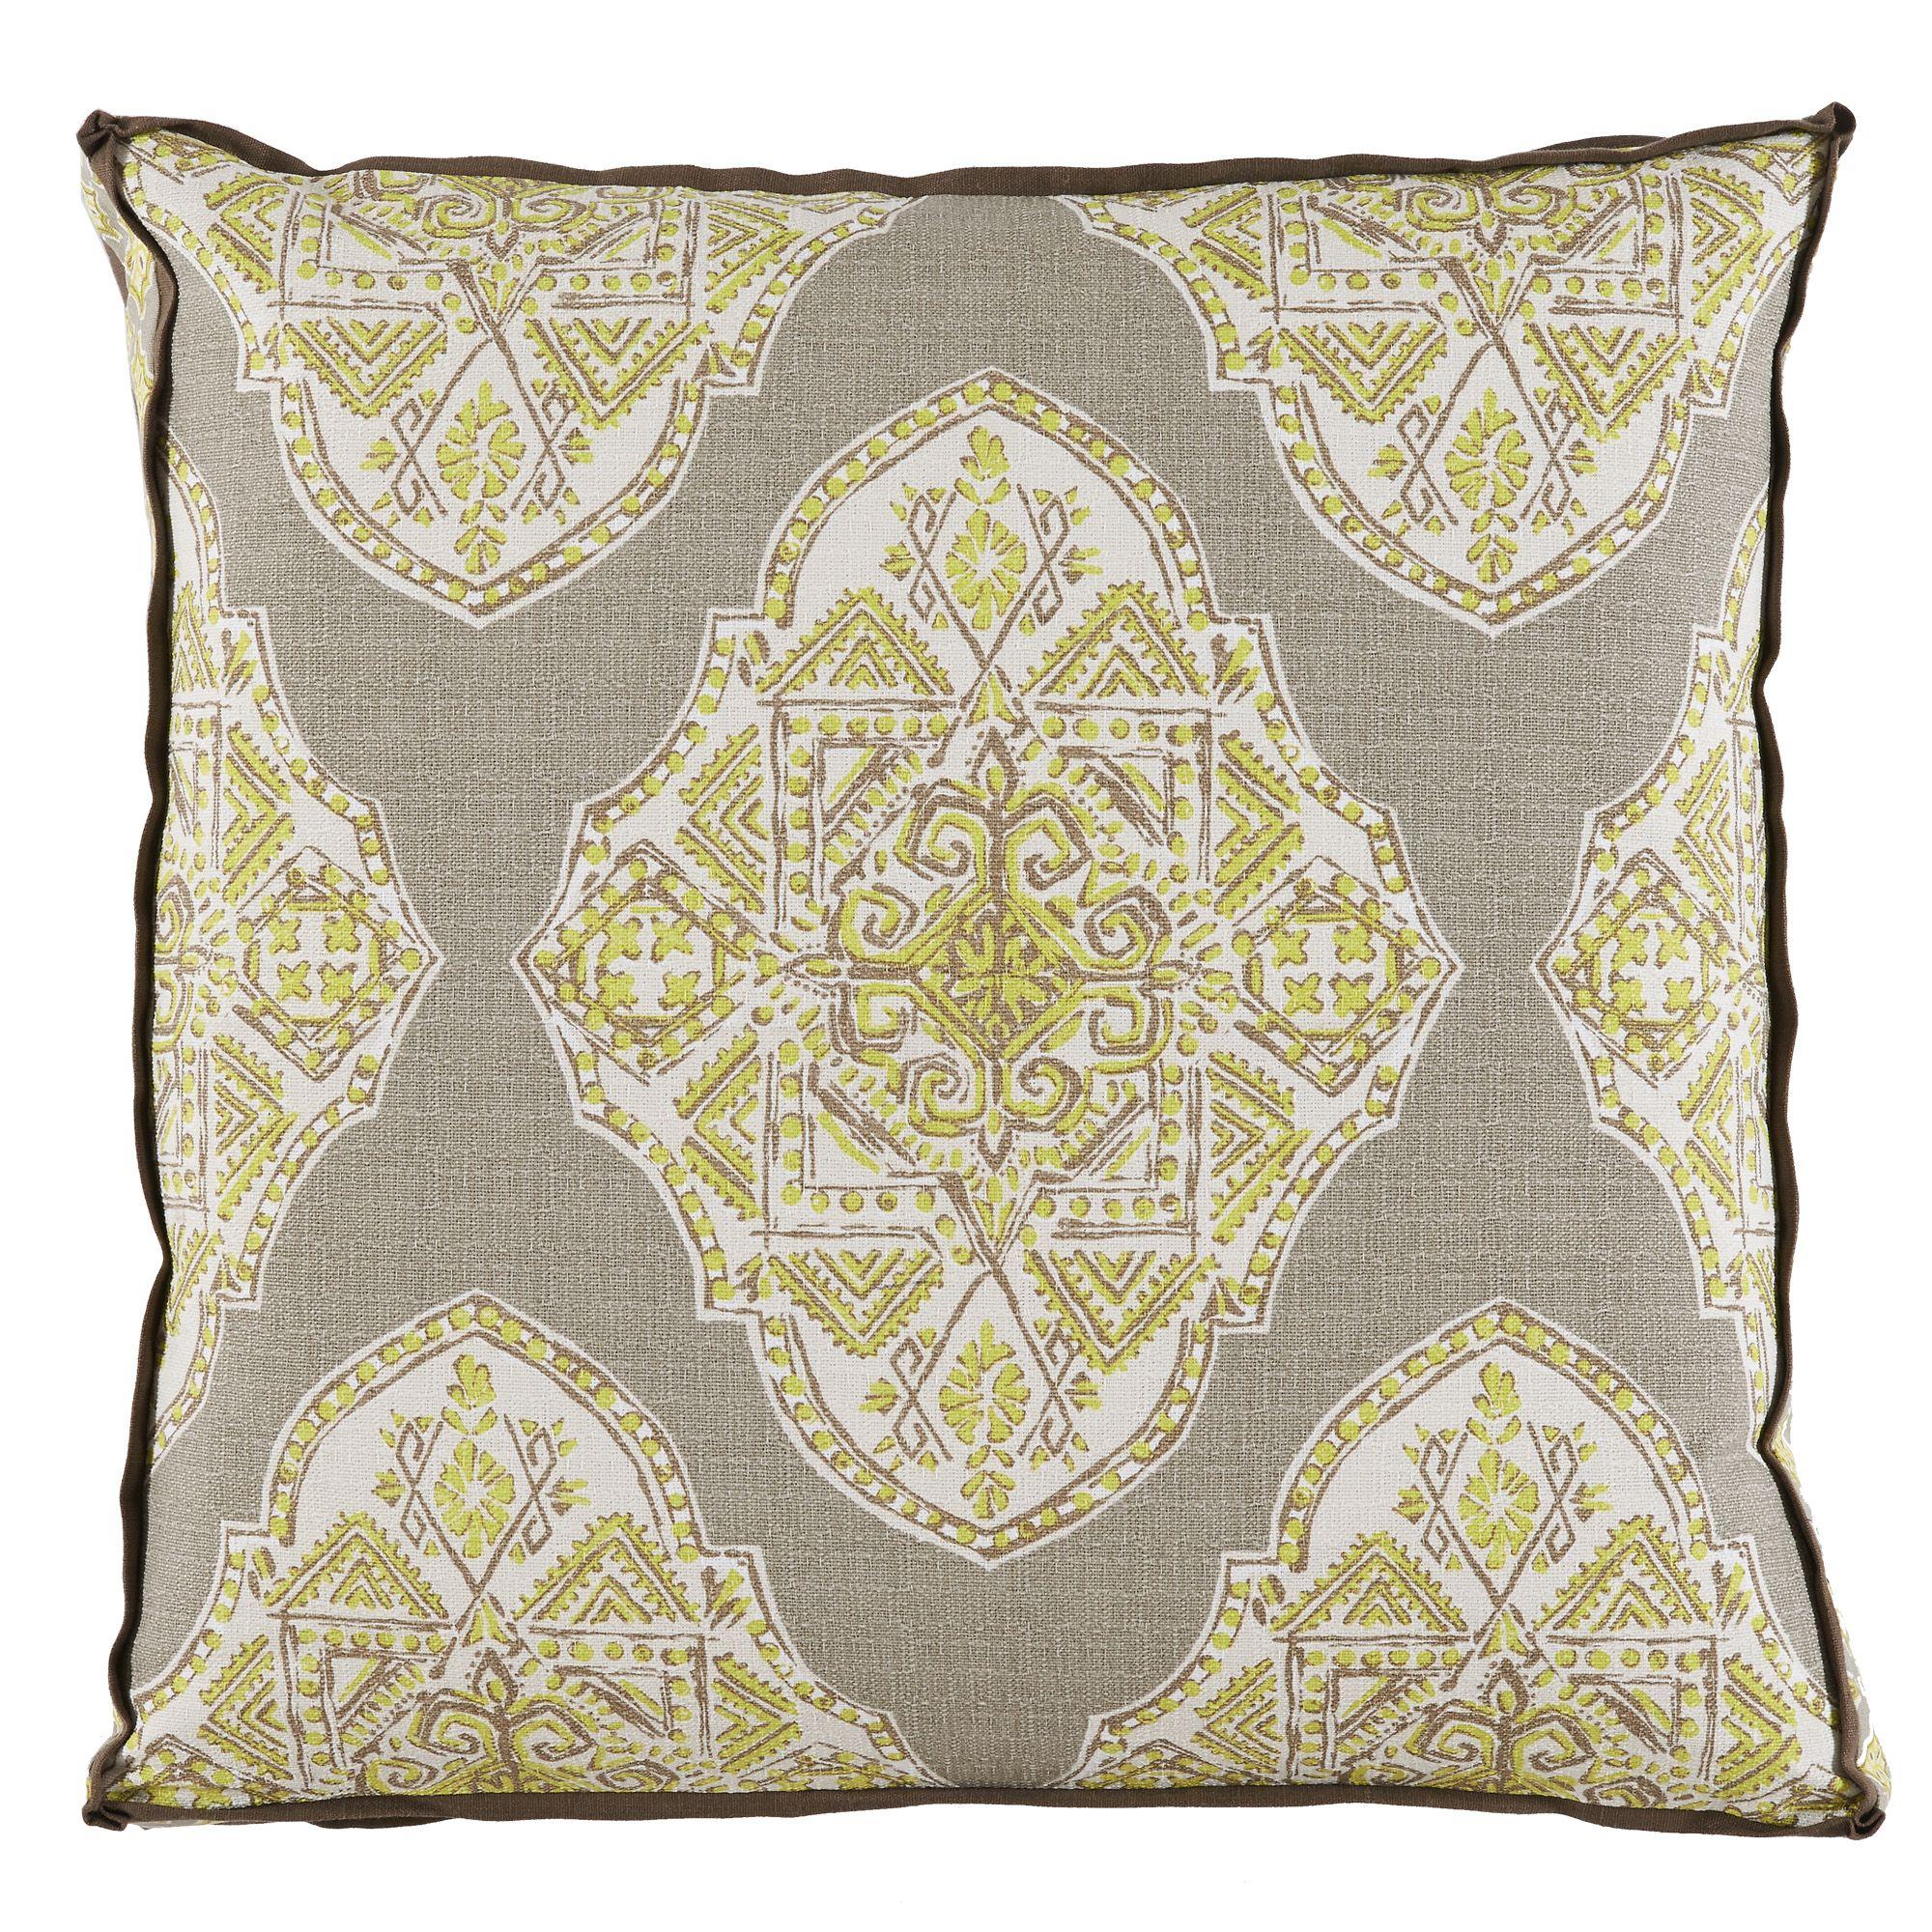 Tan Ornate Square Gusset Pillow Neutral Pillow Gusset Pillow Decorative Pillo Pillows Decorative Patterns Pillow Decorative Bedroom Large Decorative Pillows